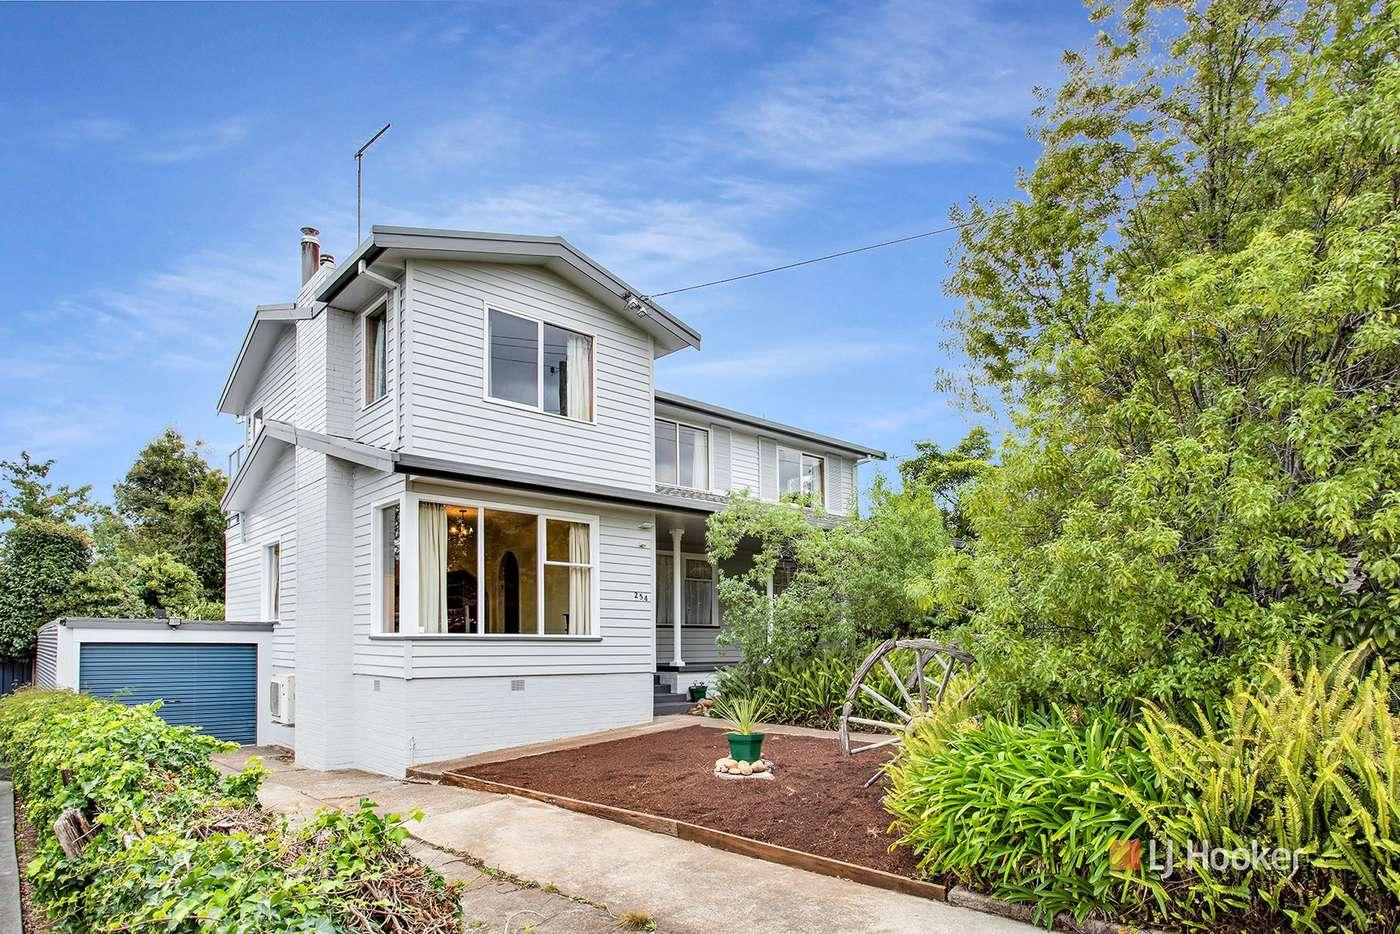 Main view of Homely house listing, 254 Steele Street, Devonport TAS 7310